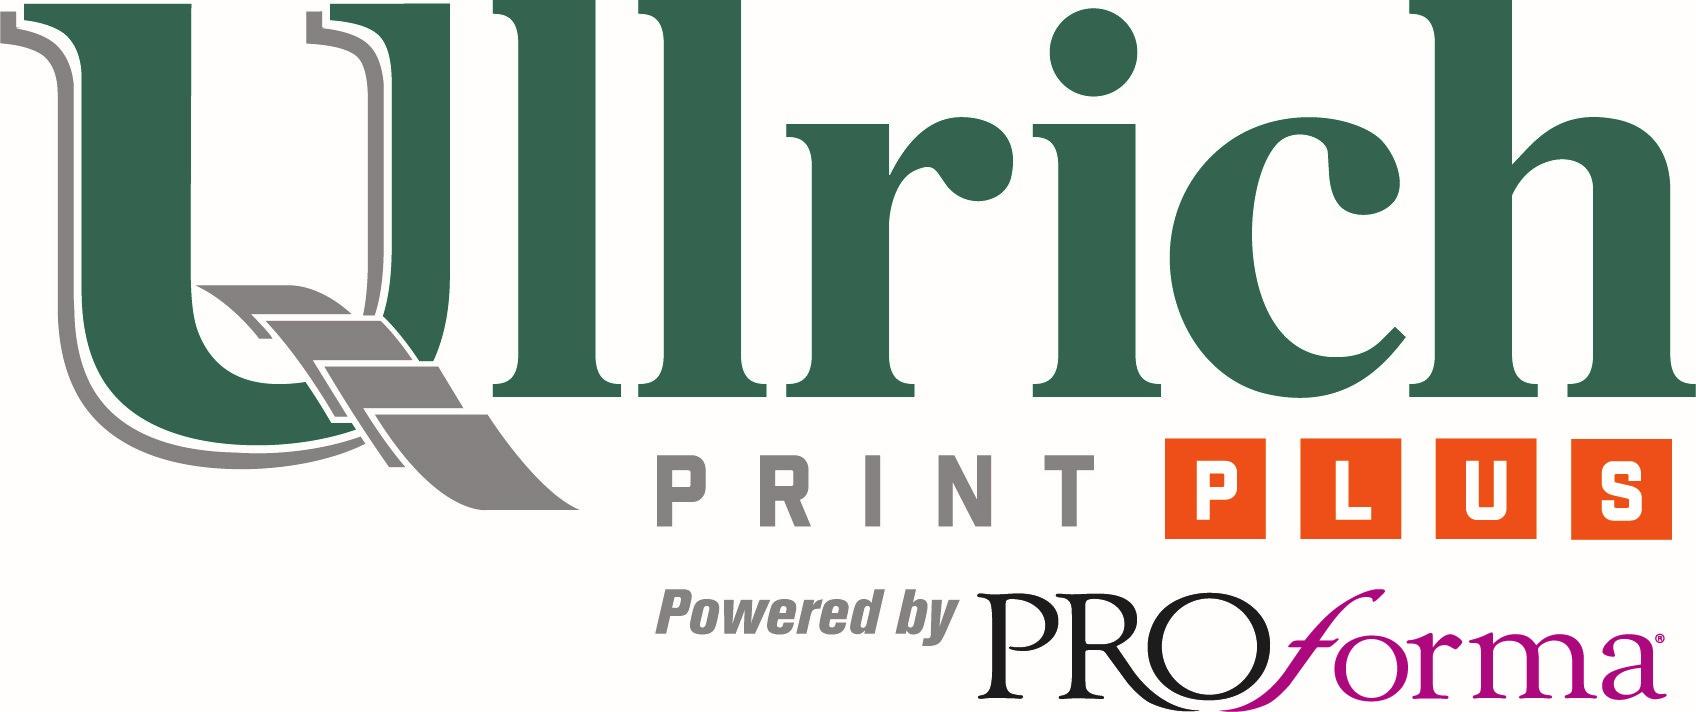 Ullrichprinting_logo